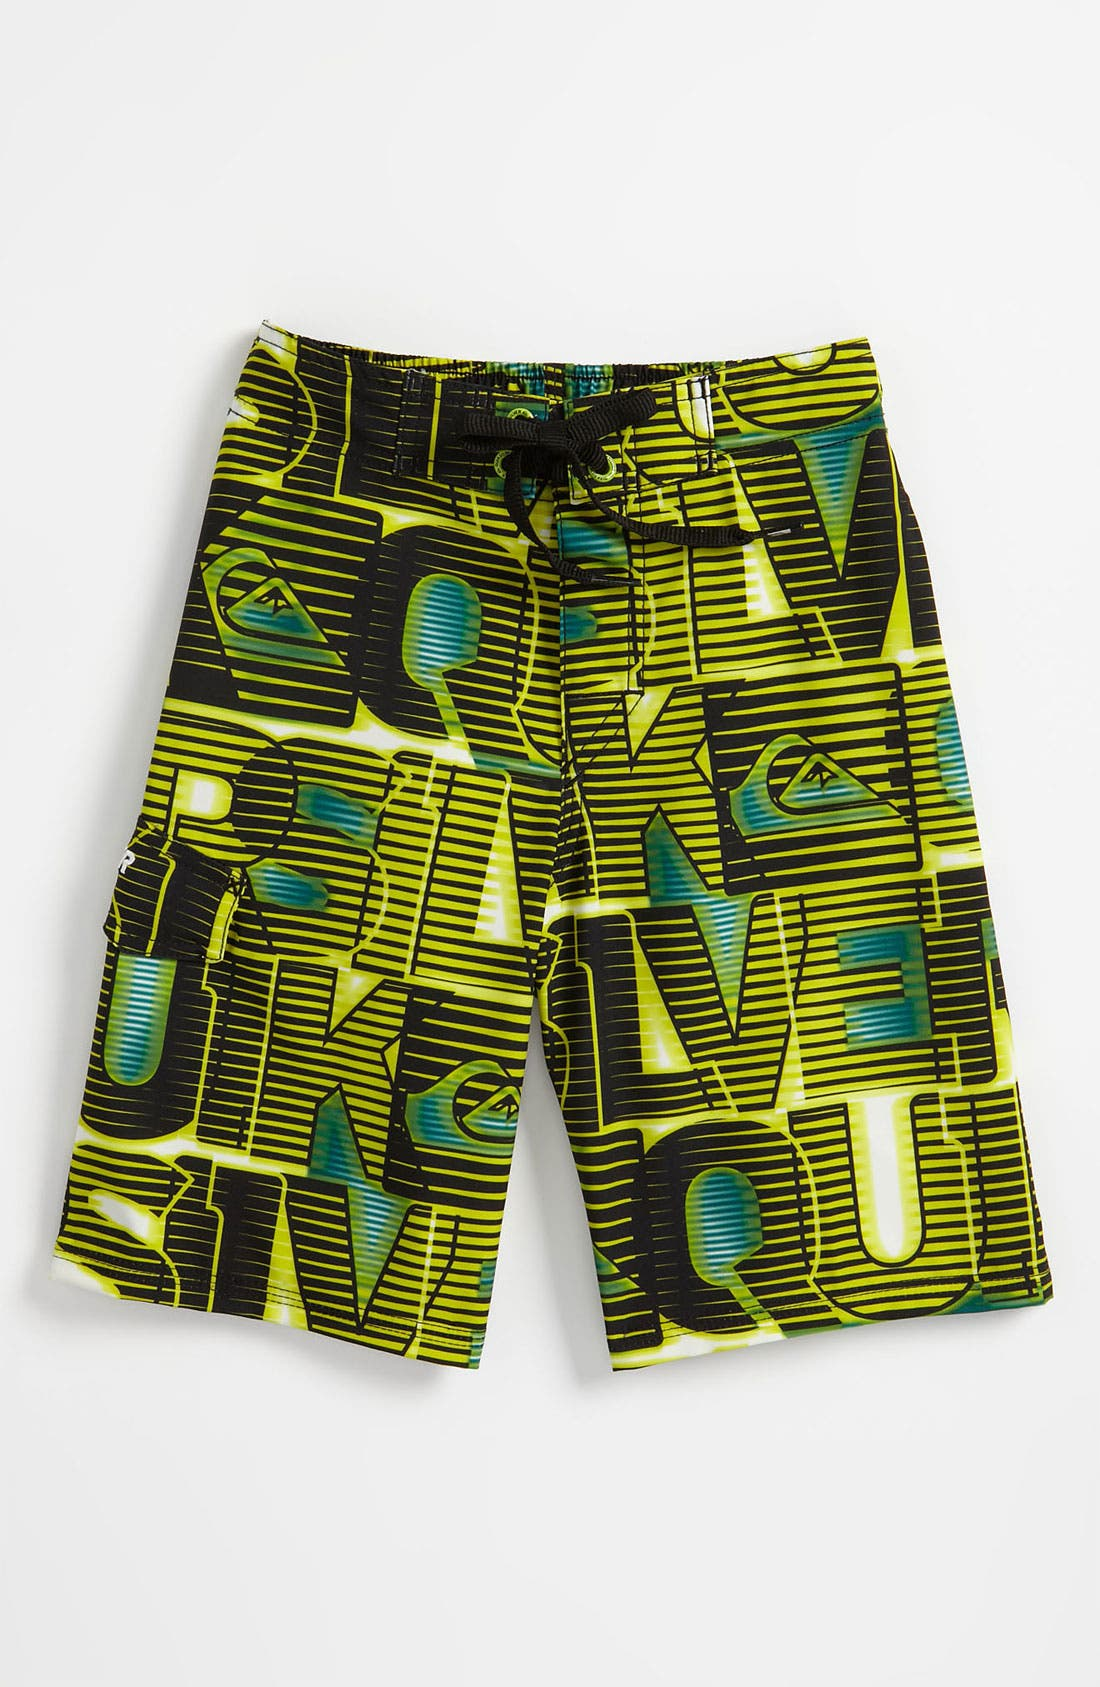 Alternate Image 1 Selected - Quiksilver 'Dizzy' Board Shorts (Little Boys)